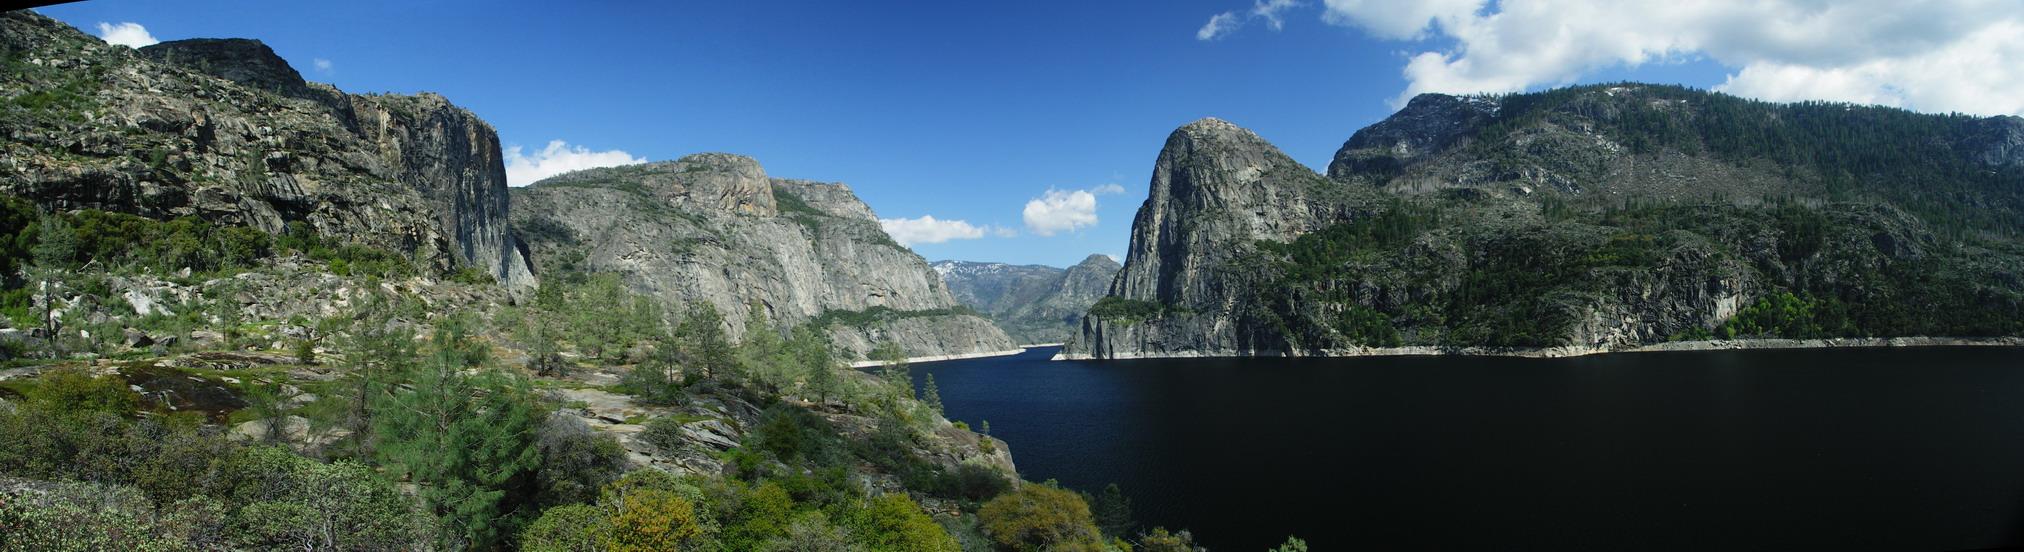 Yosemite Falls Wallpaper Yosemite Panorama Pictures